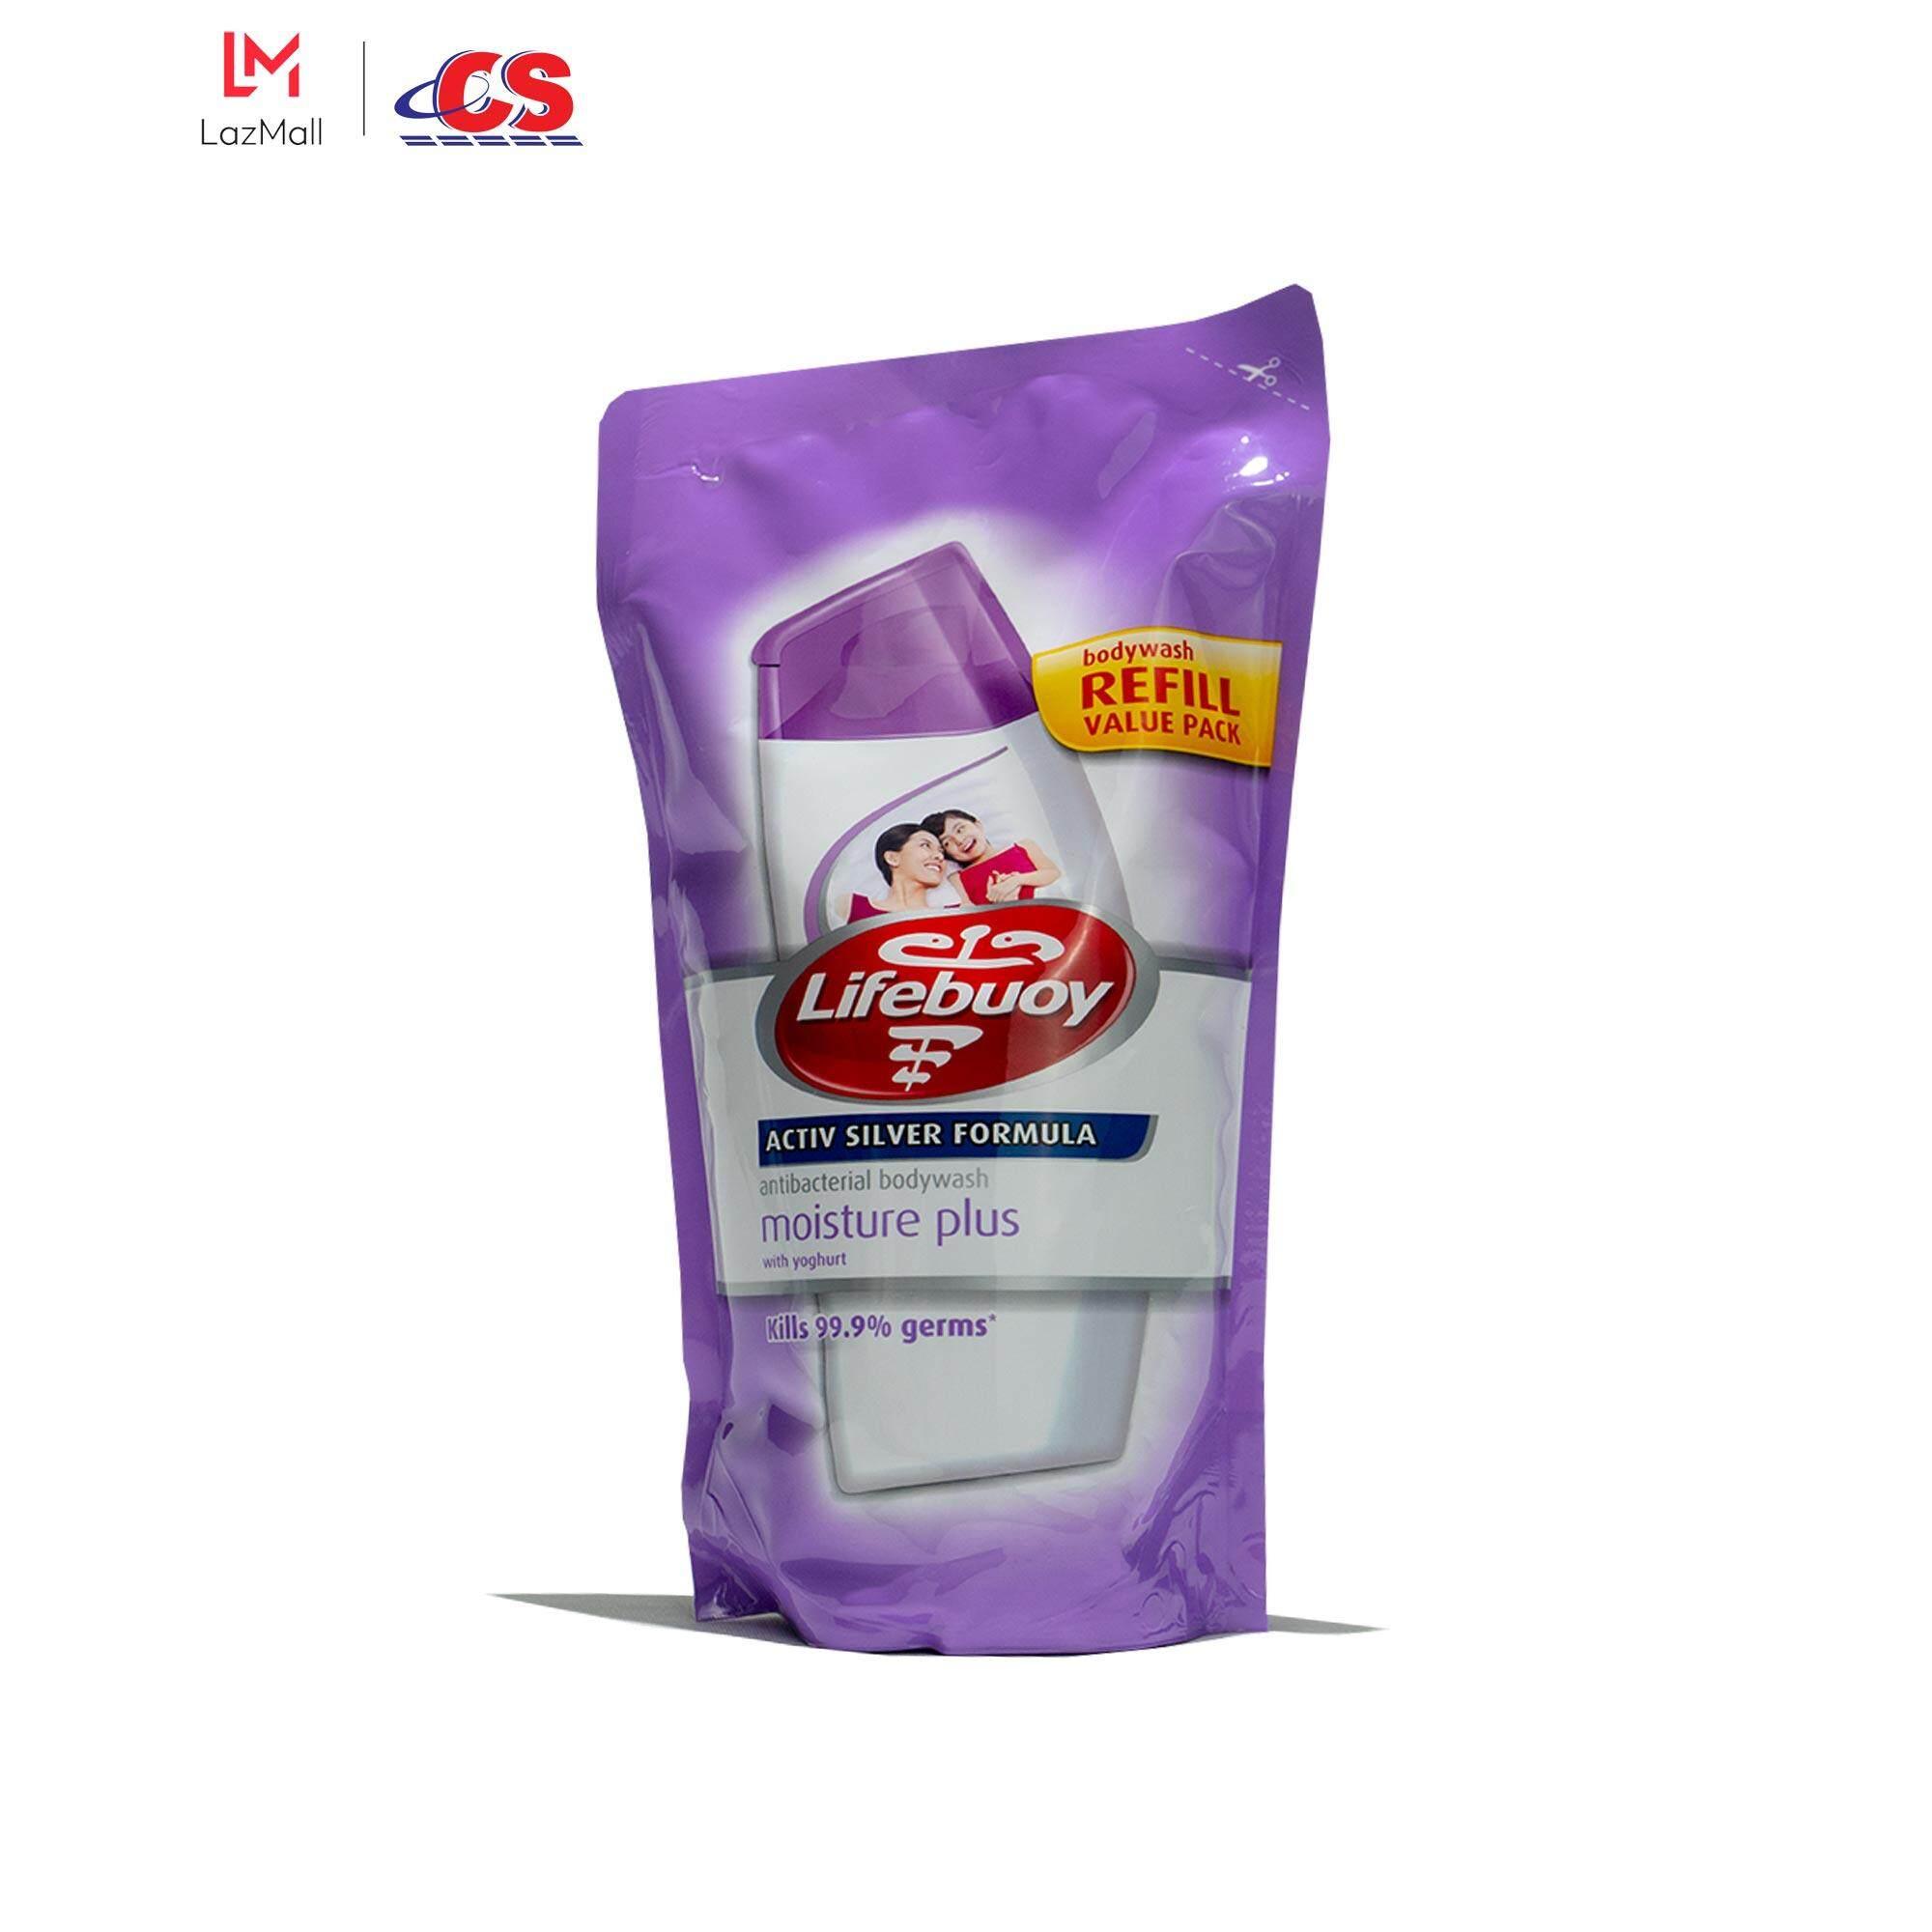 LIFEBUOY Bodywash Moisture Plus Refill 850ml